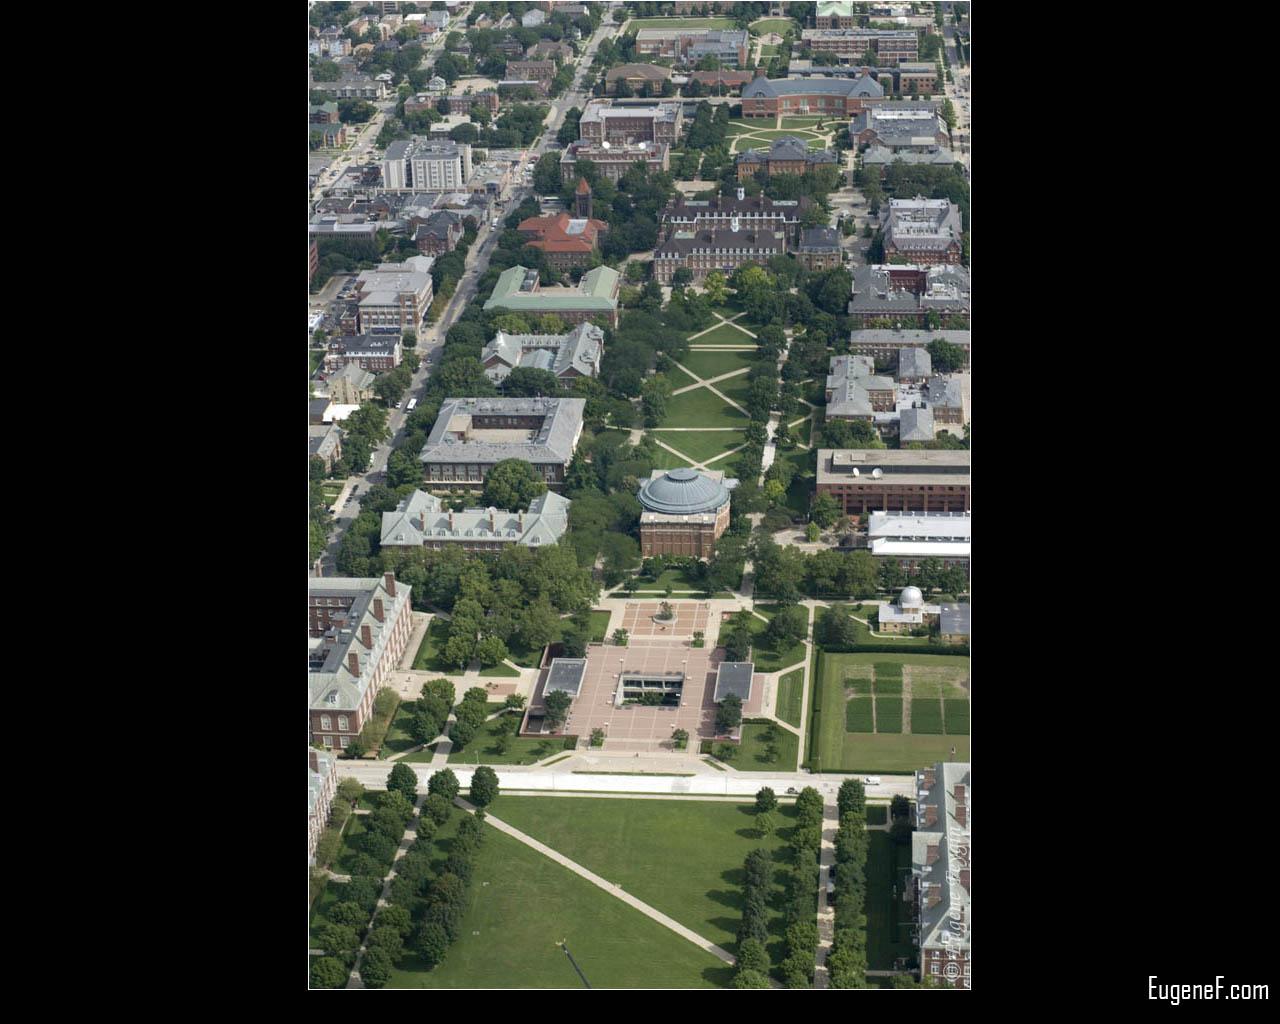 University of Illinois Quad